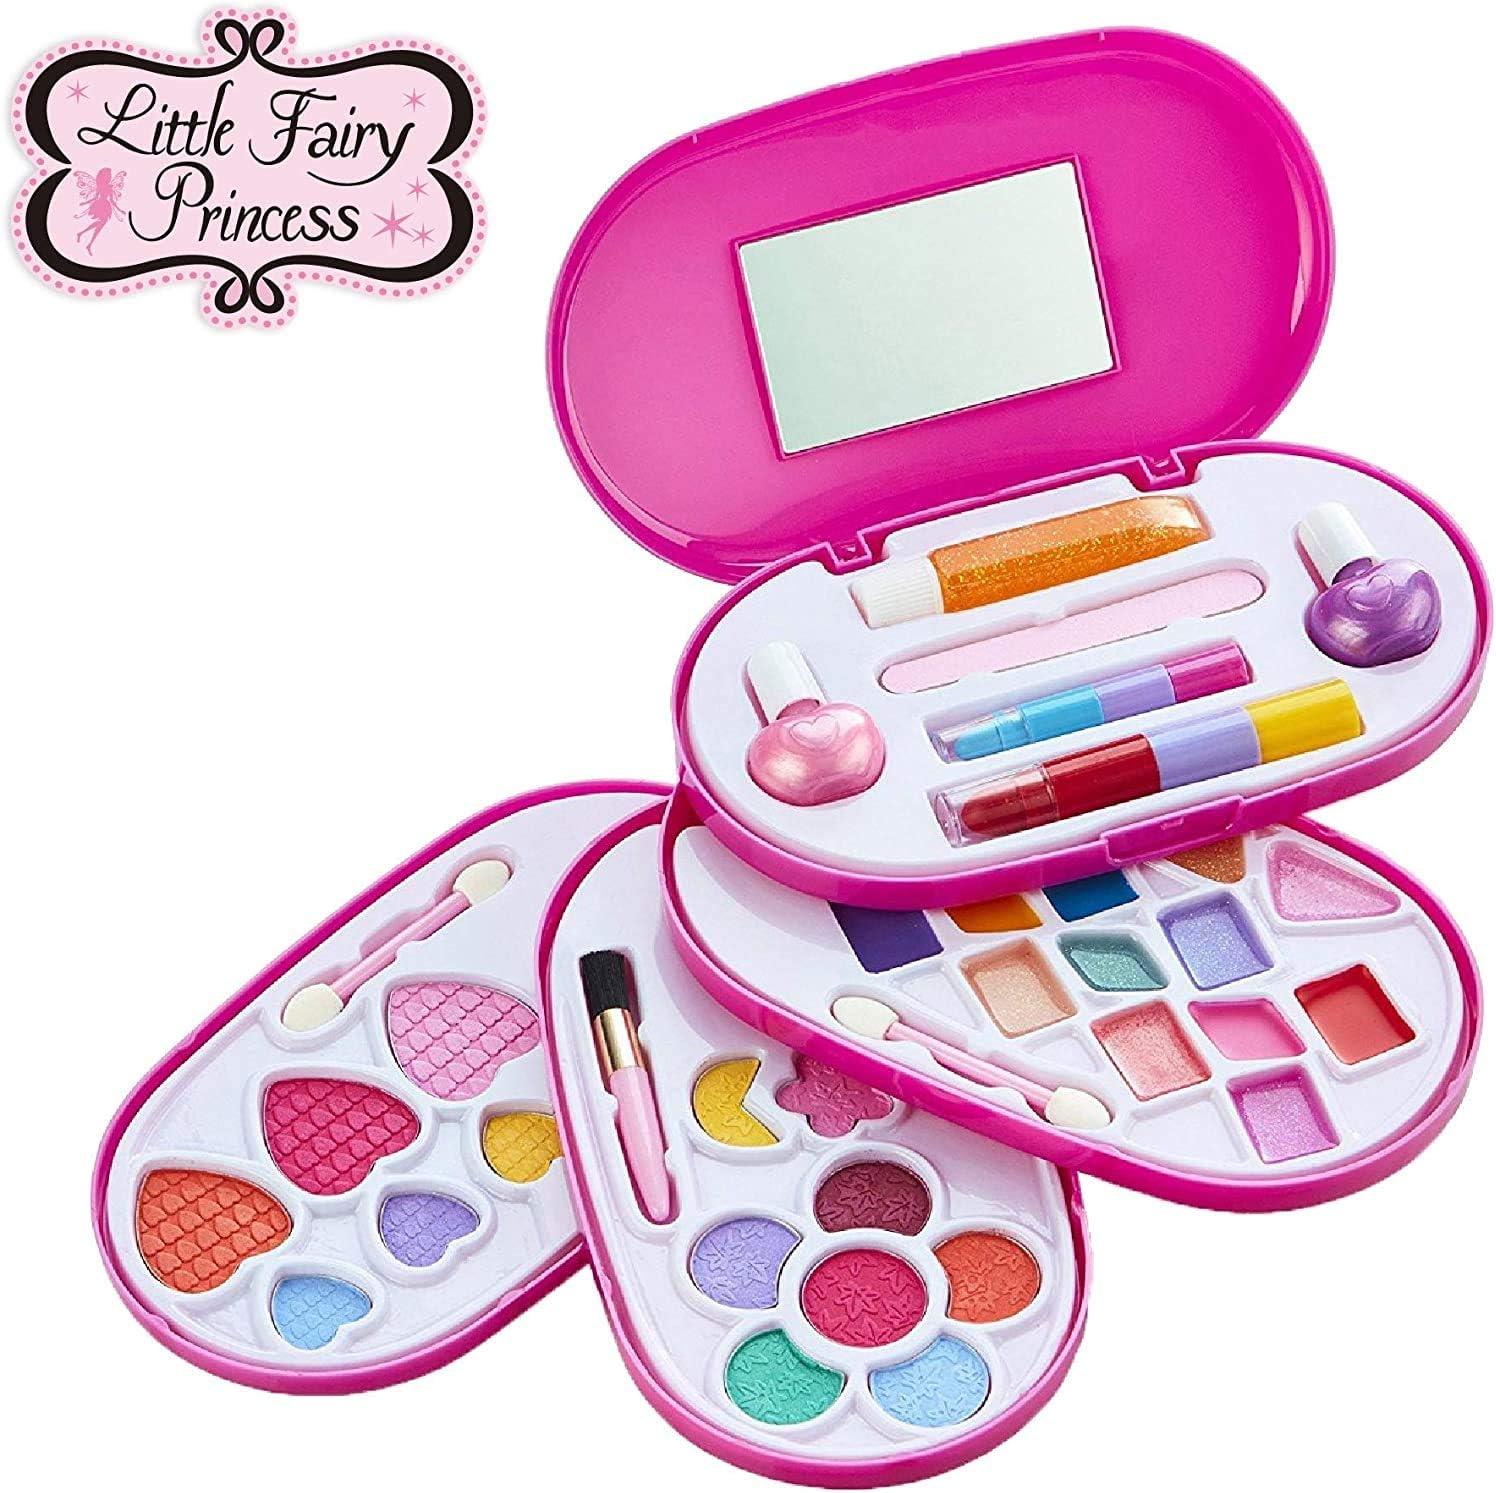 Little Fairy Princess – Estuche de Maquillaje Lavable para niñas - Set de cosméticos Infantiles de 4 Niveles - con Set de Belleza Compacto: Amazon.es: Belleza